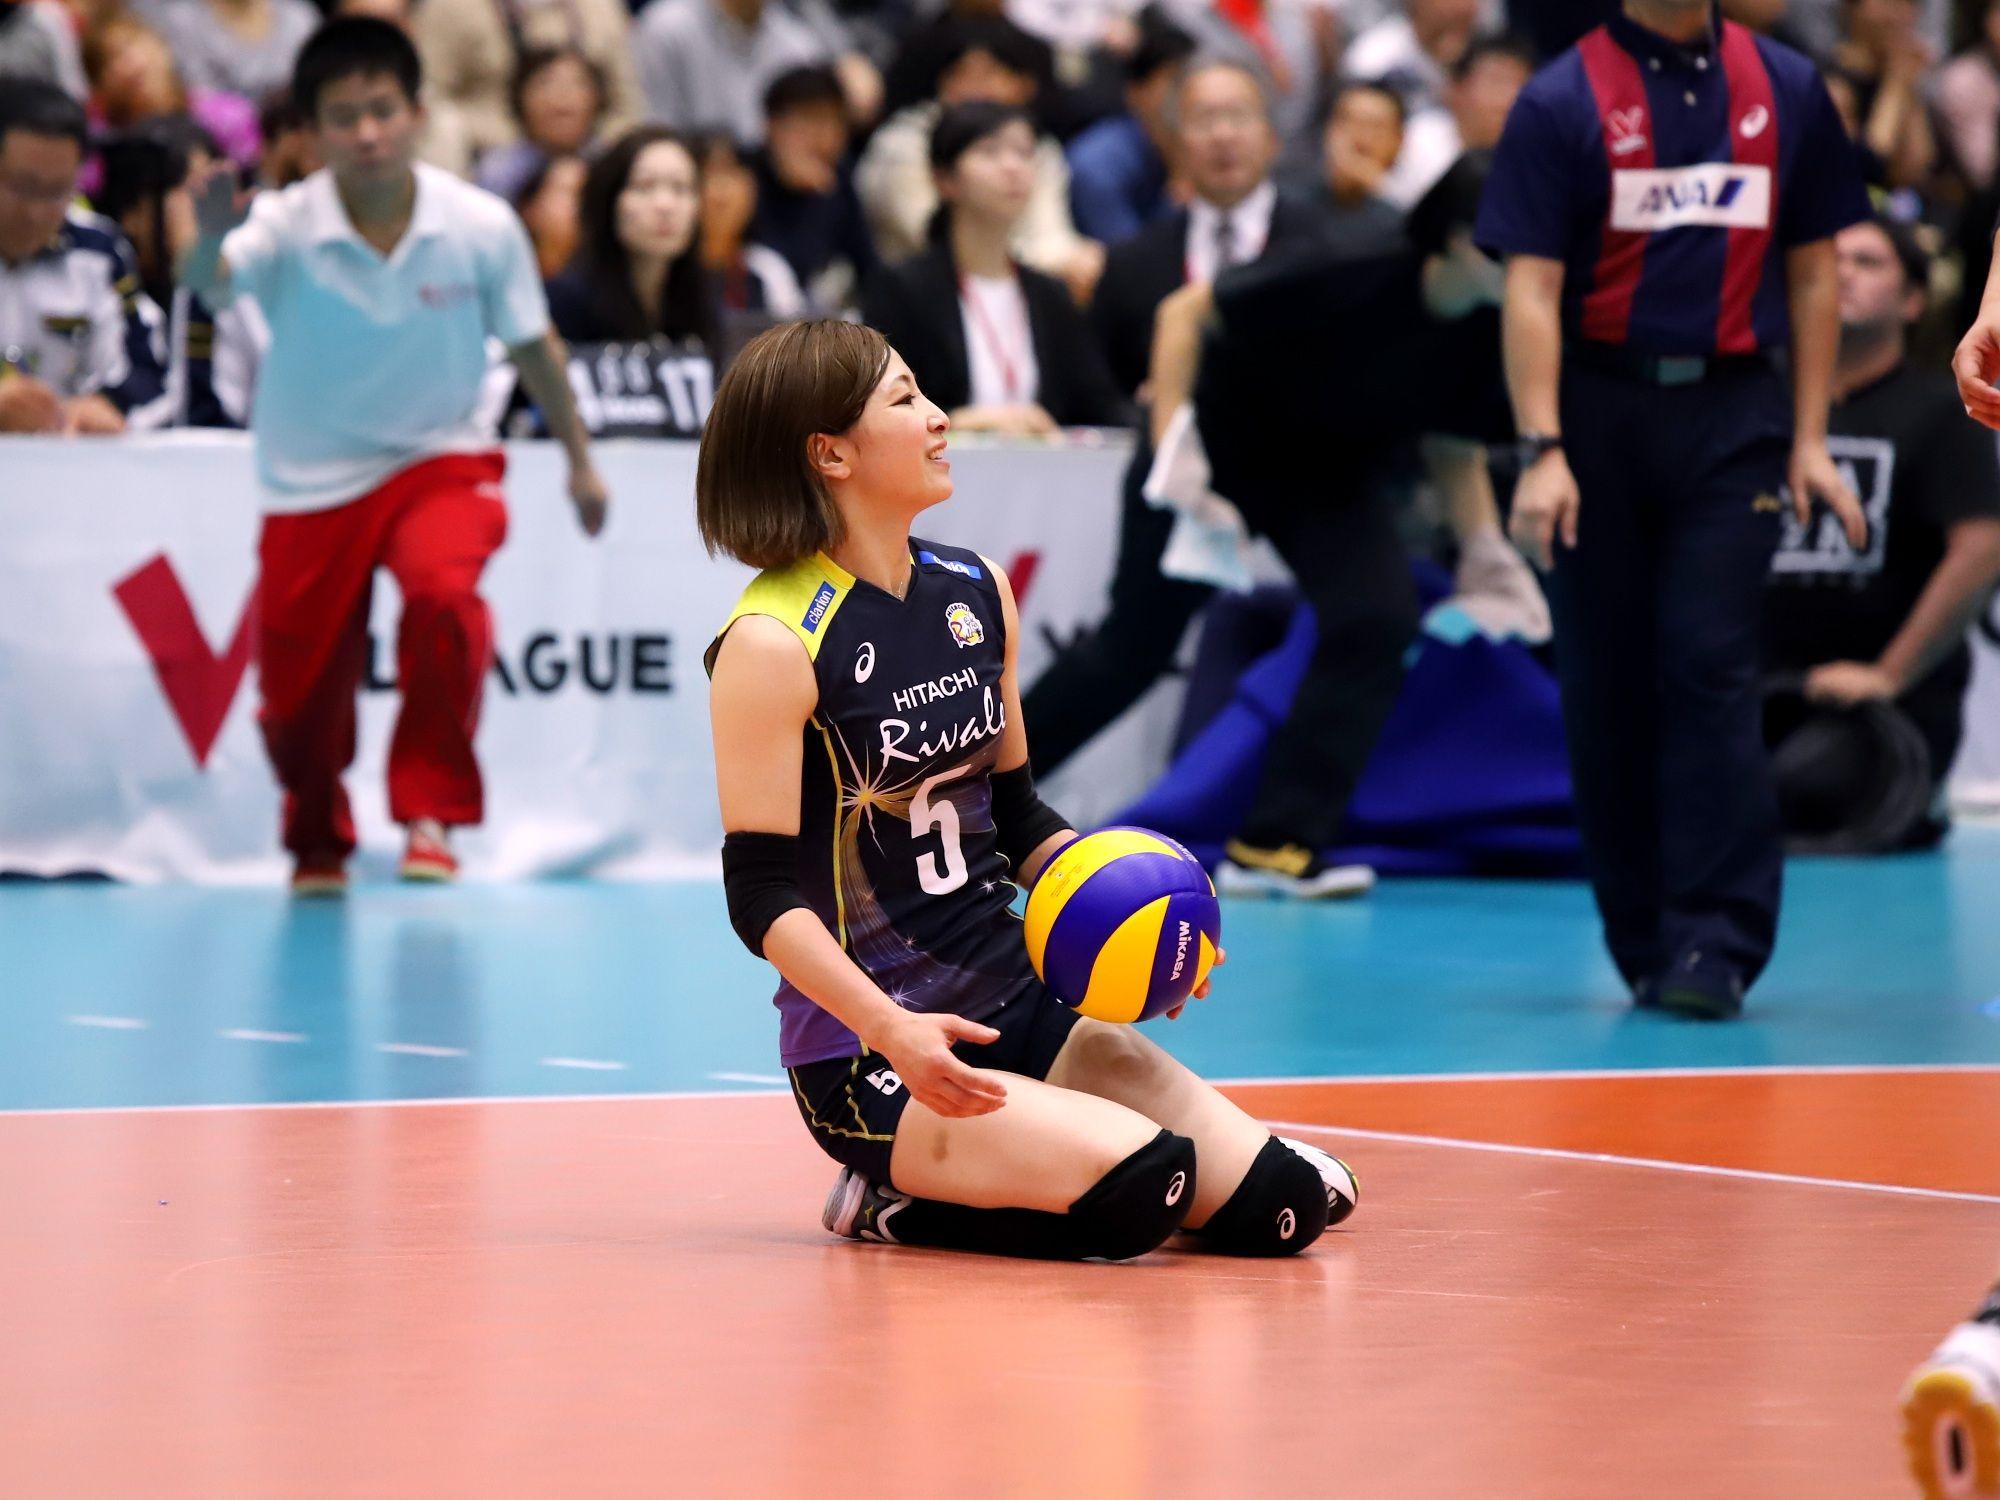 Pin Interest Arisa Sato Volleyball Players